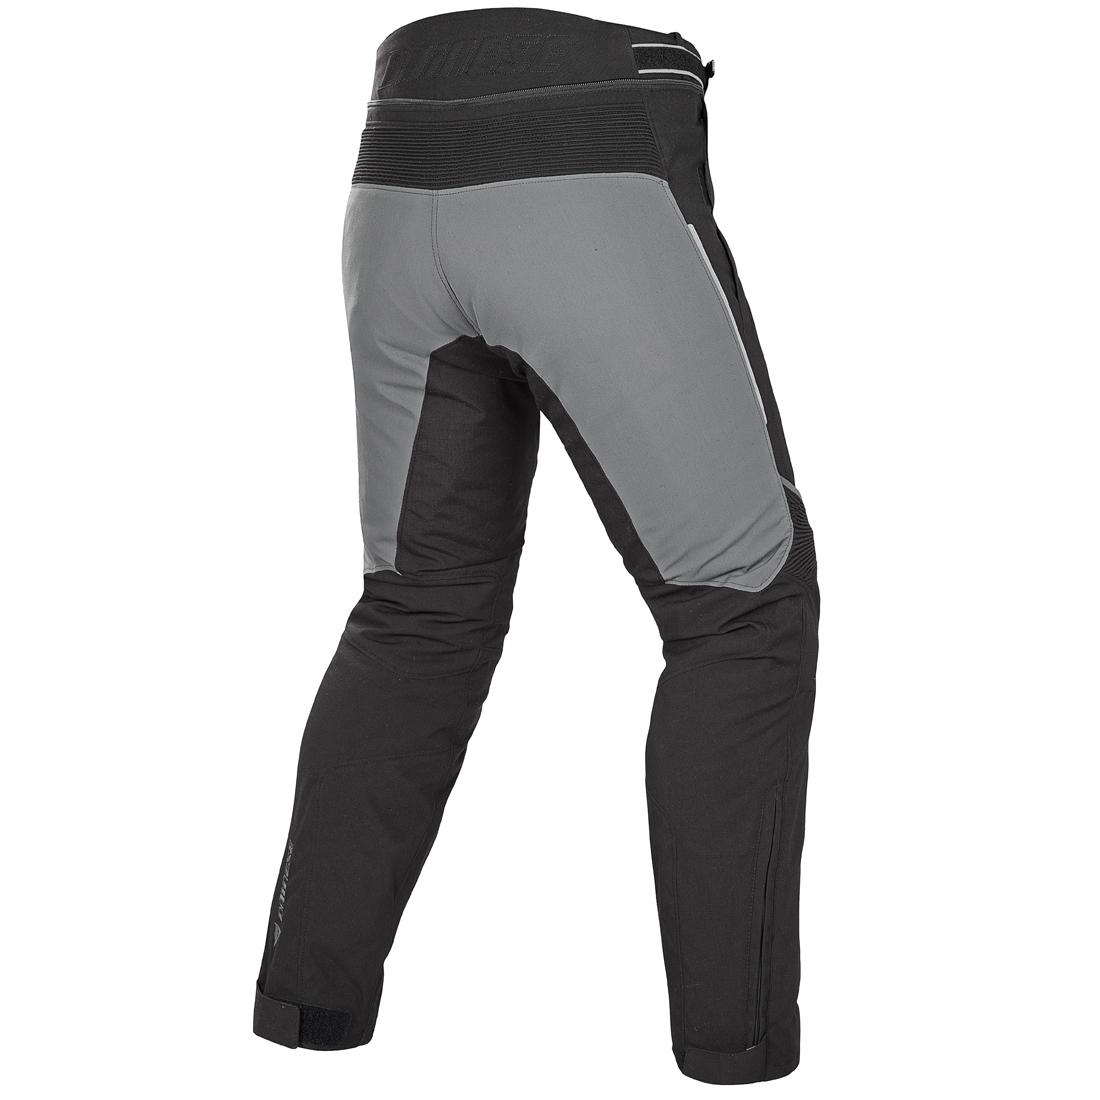 【DAINESE】P.D-EXPLORER GORE-TEX車褲 - 「Webike-摩托百貨」